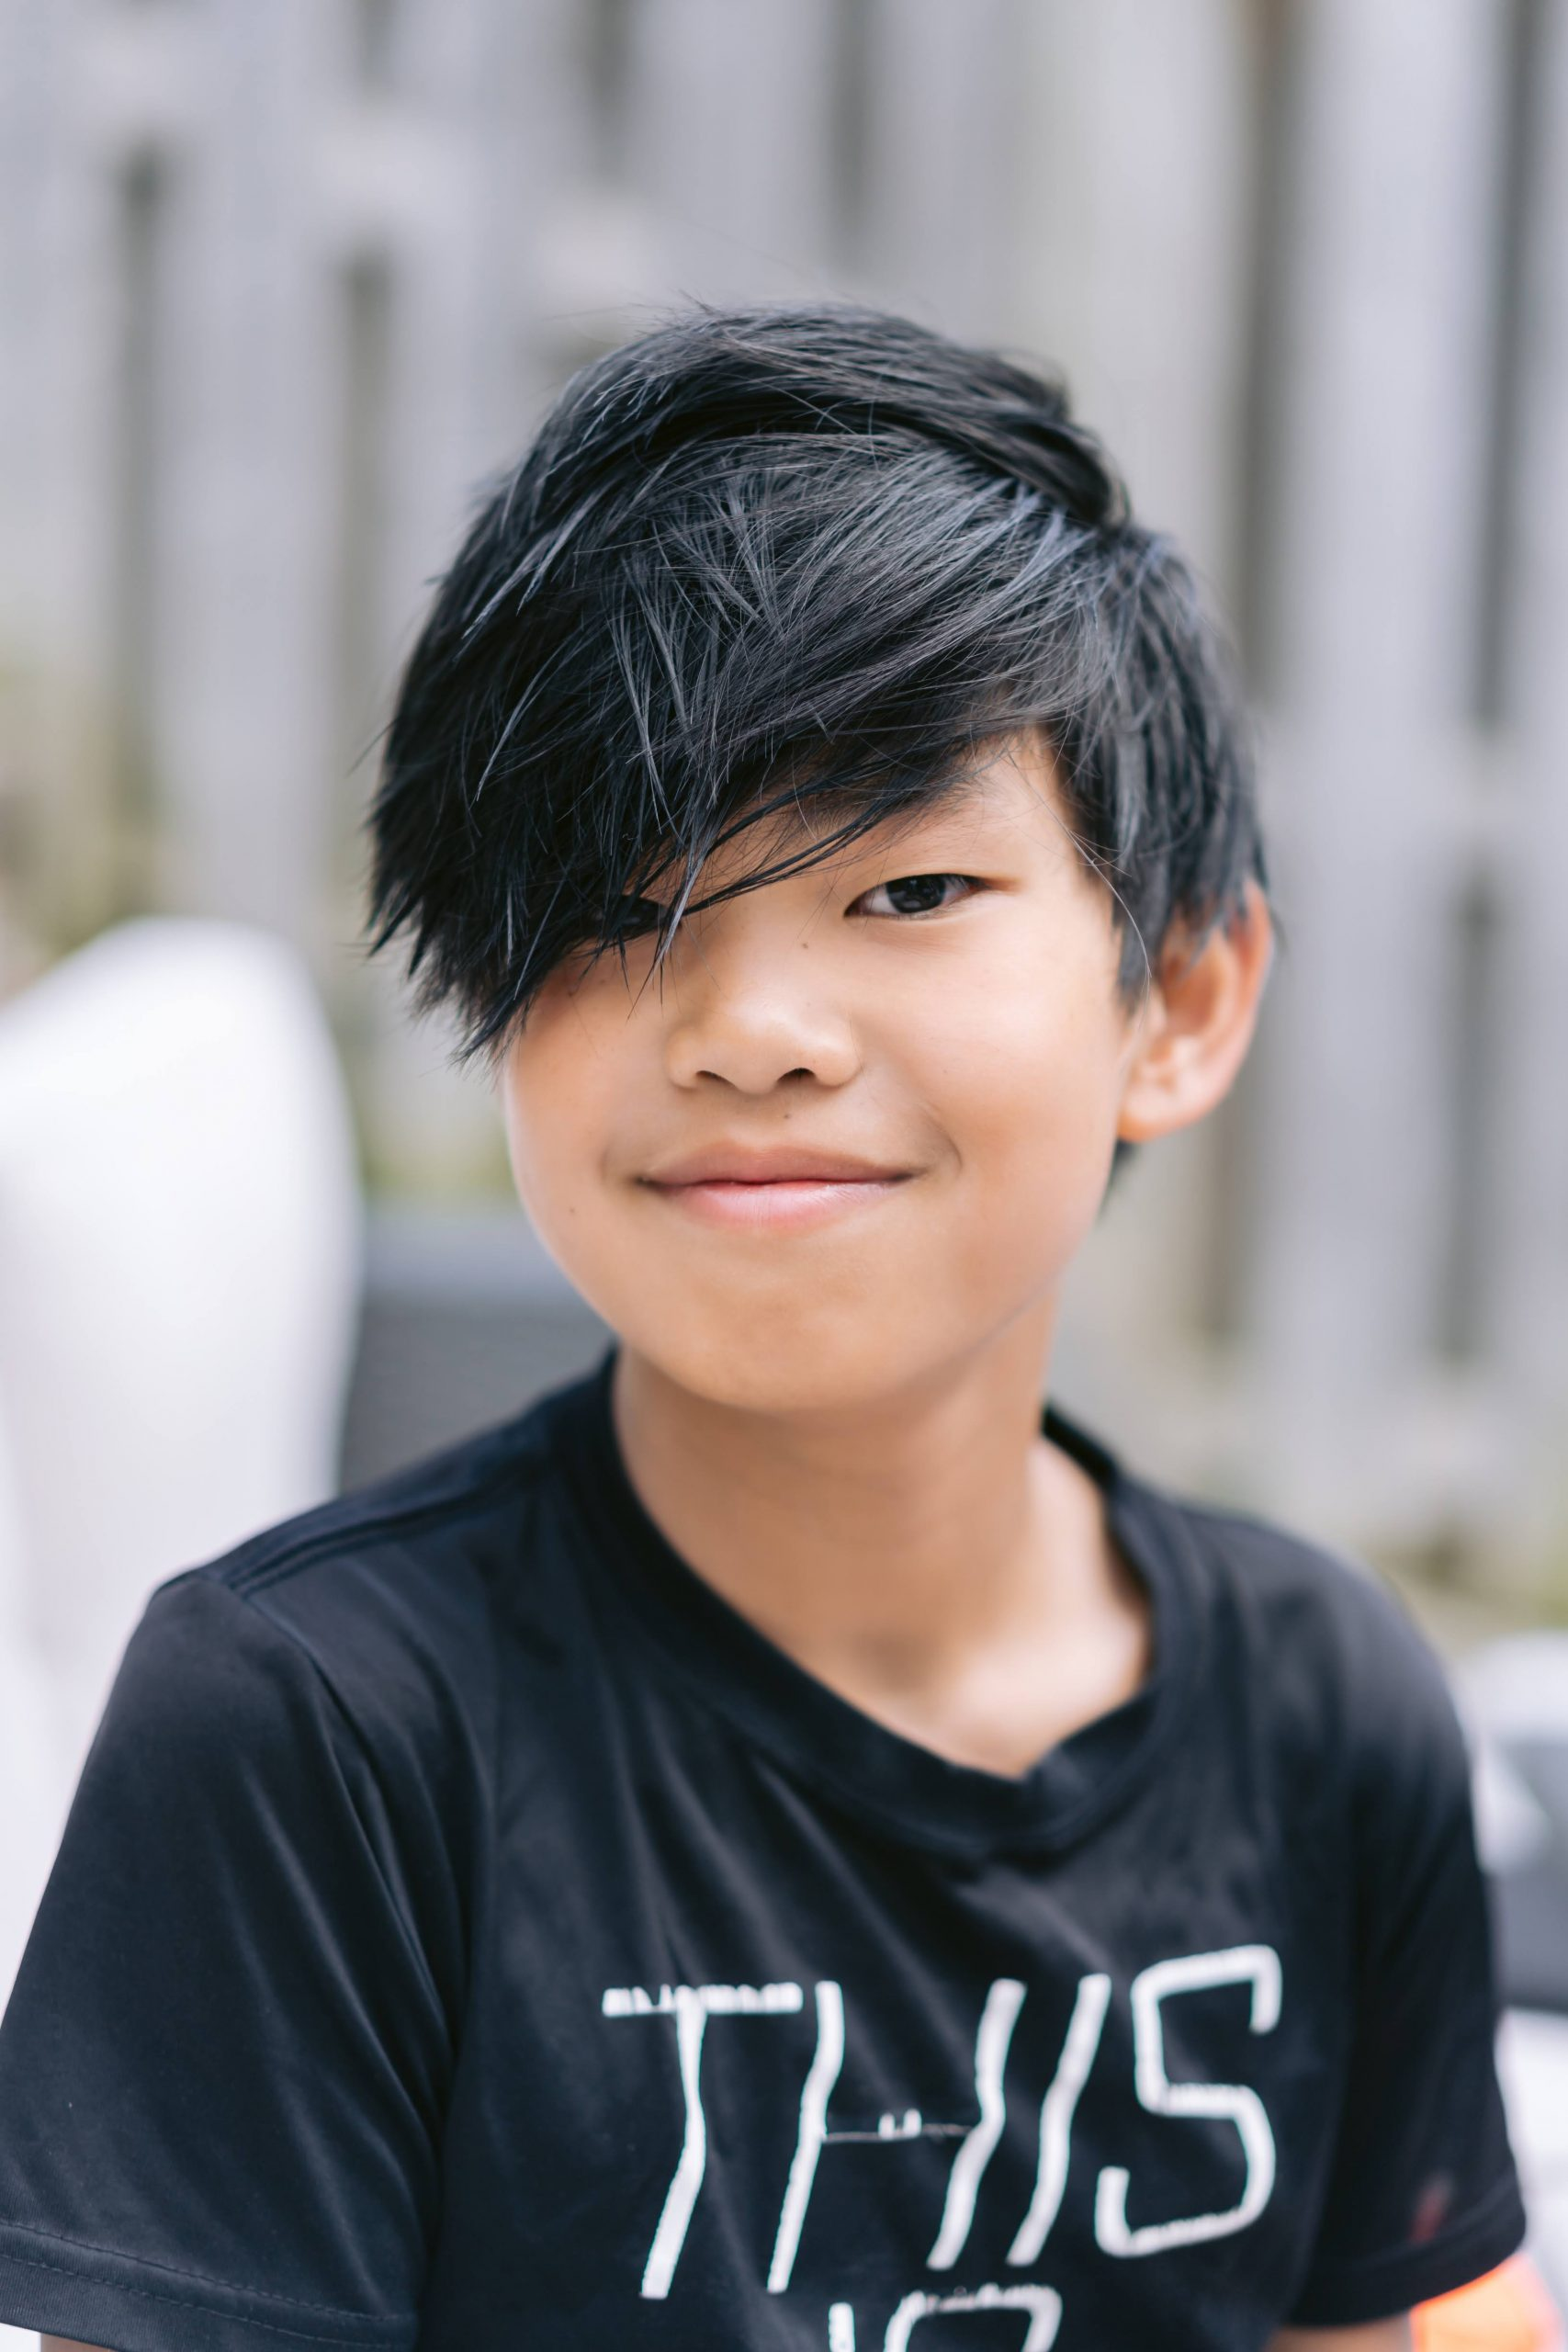 A photo Joee Wong's first son.